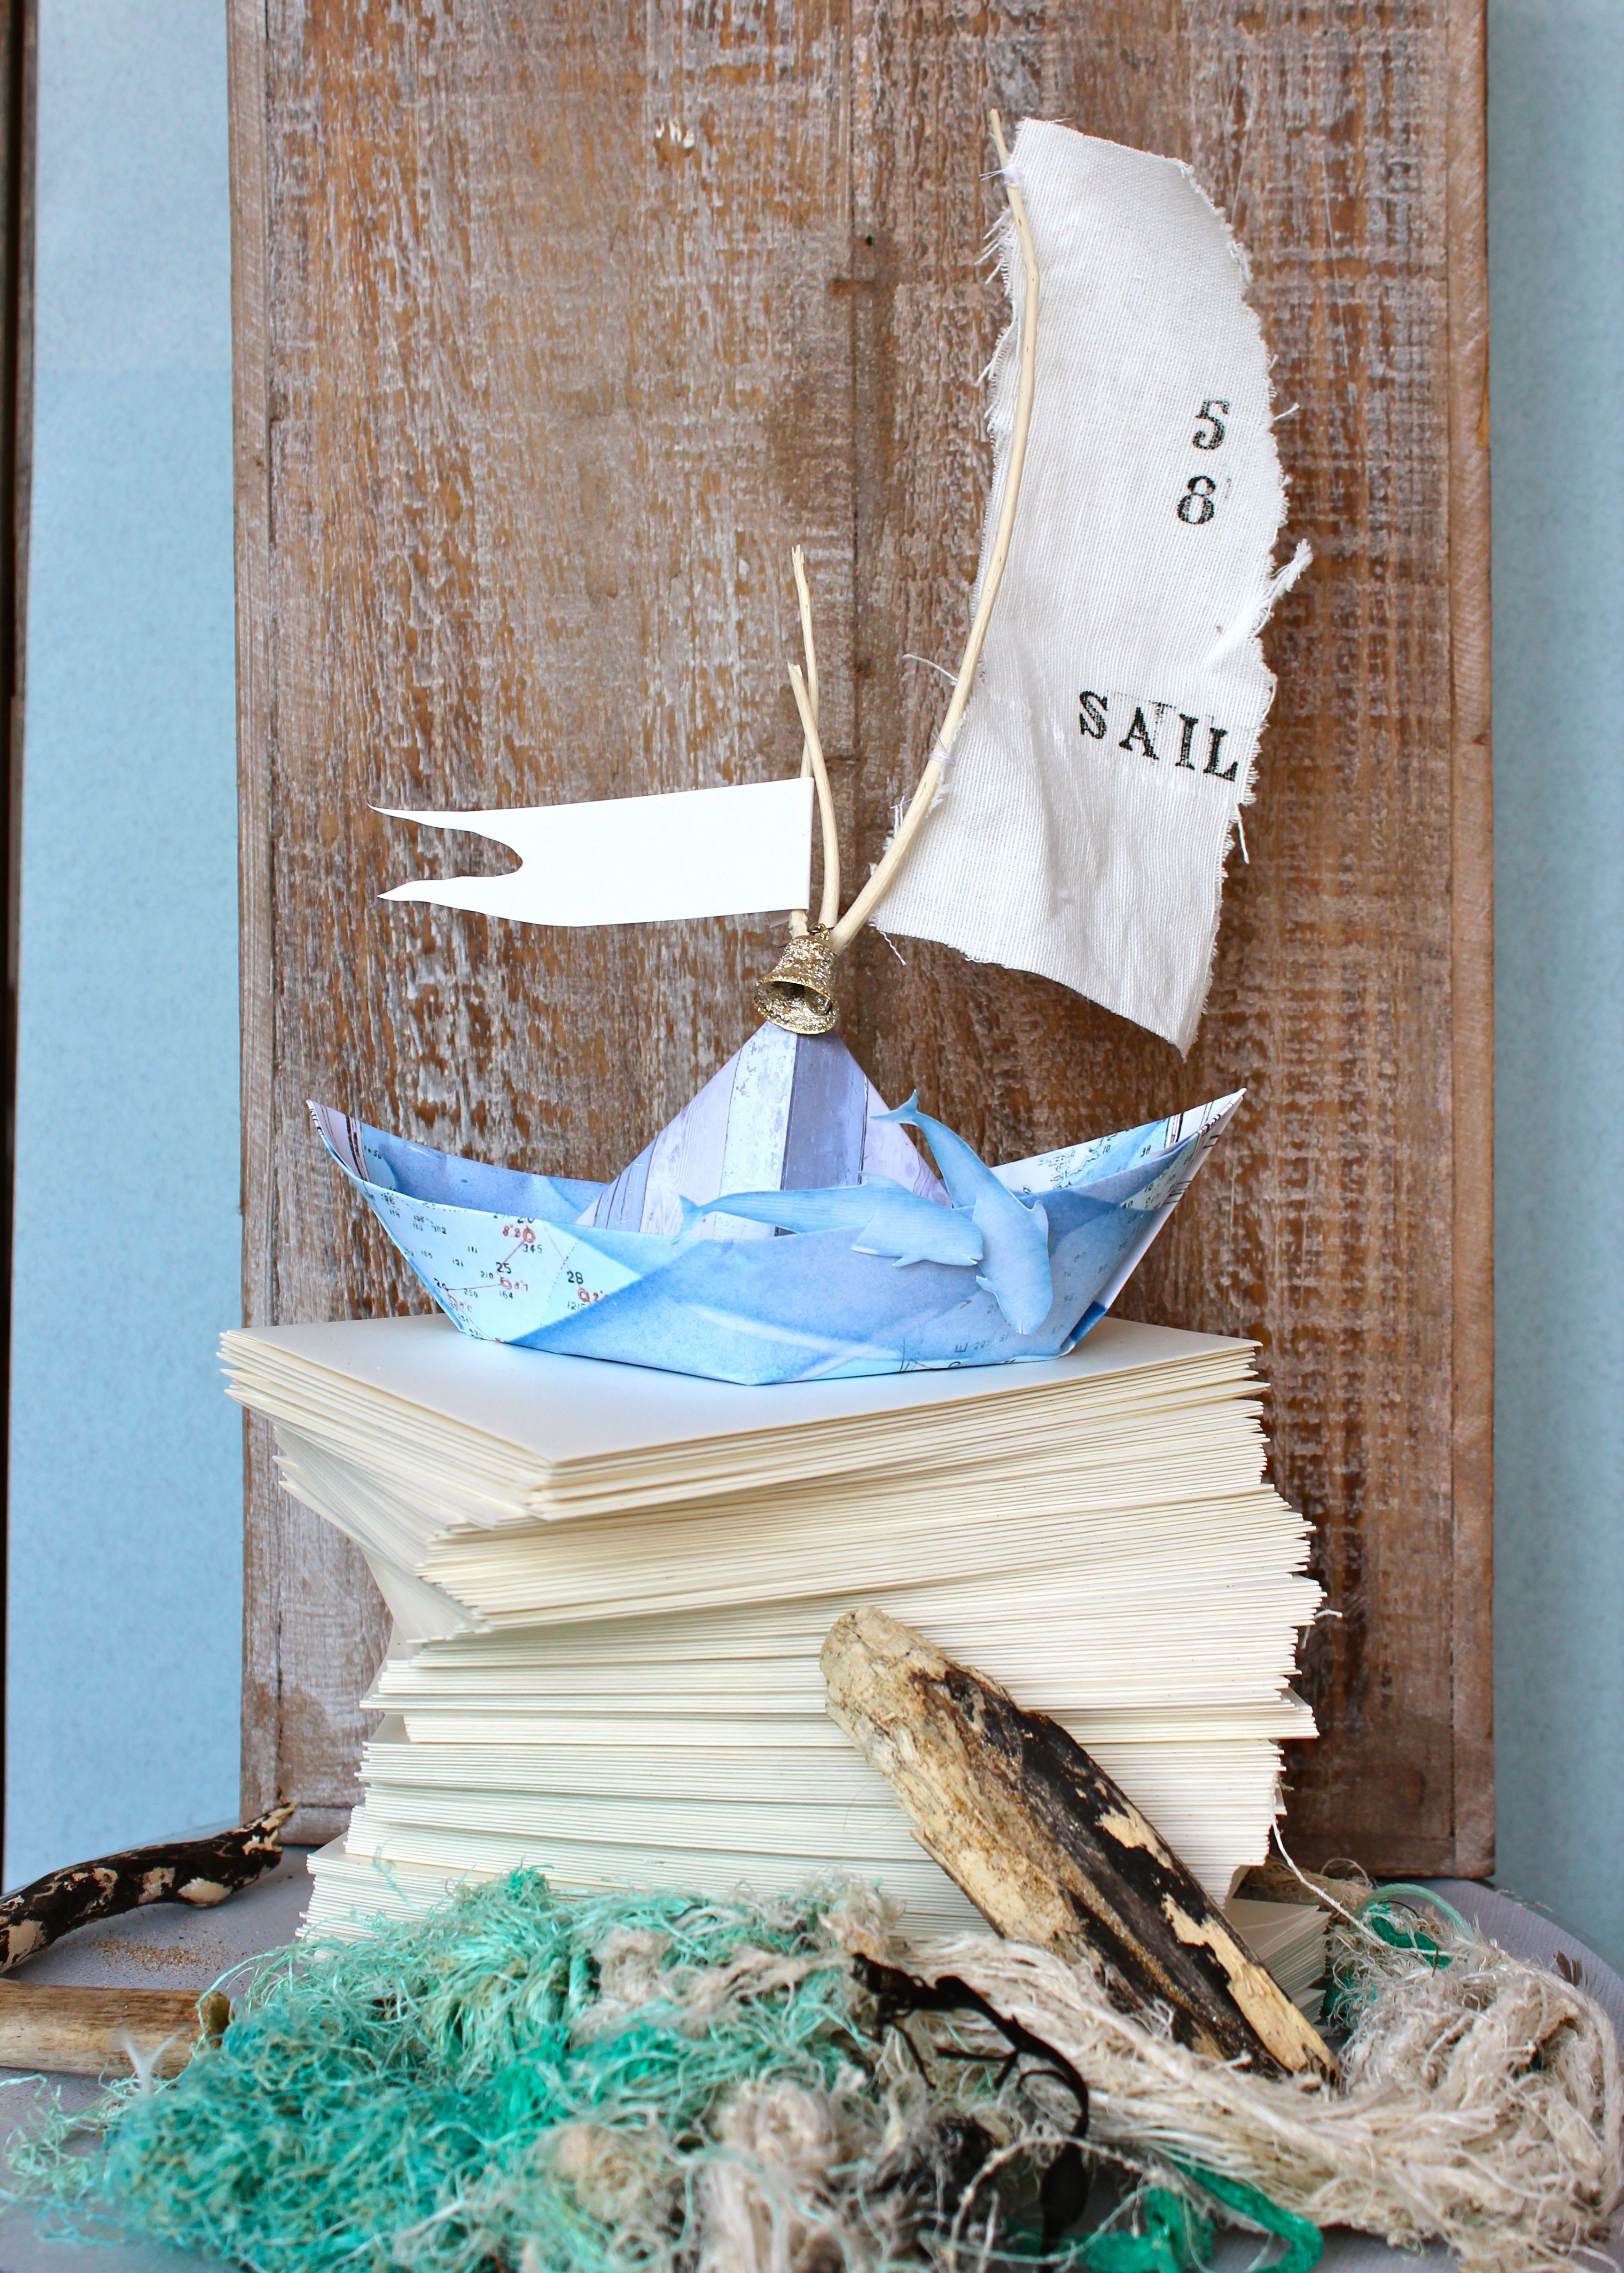 Septcoji paper boat designs for kids malvernweather Choice Image